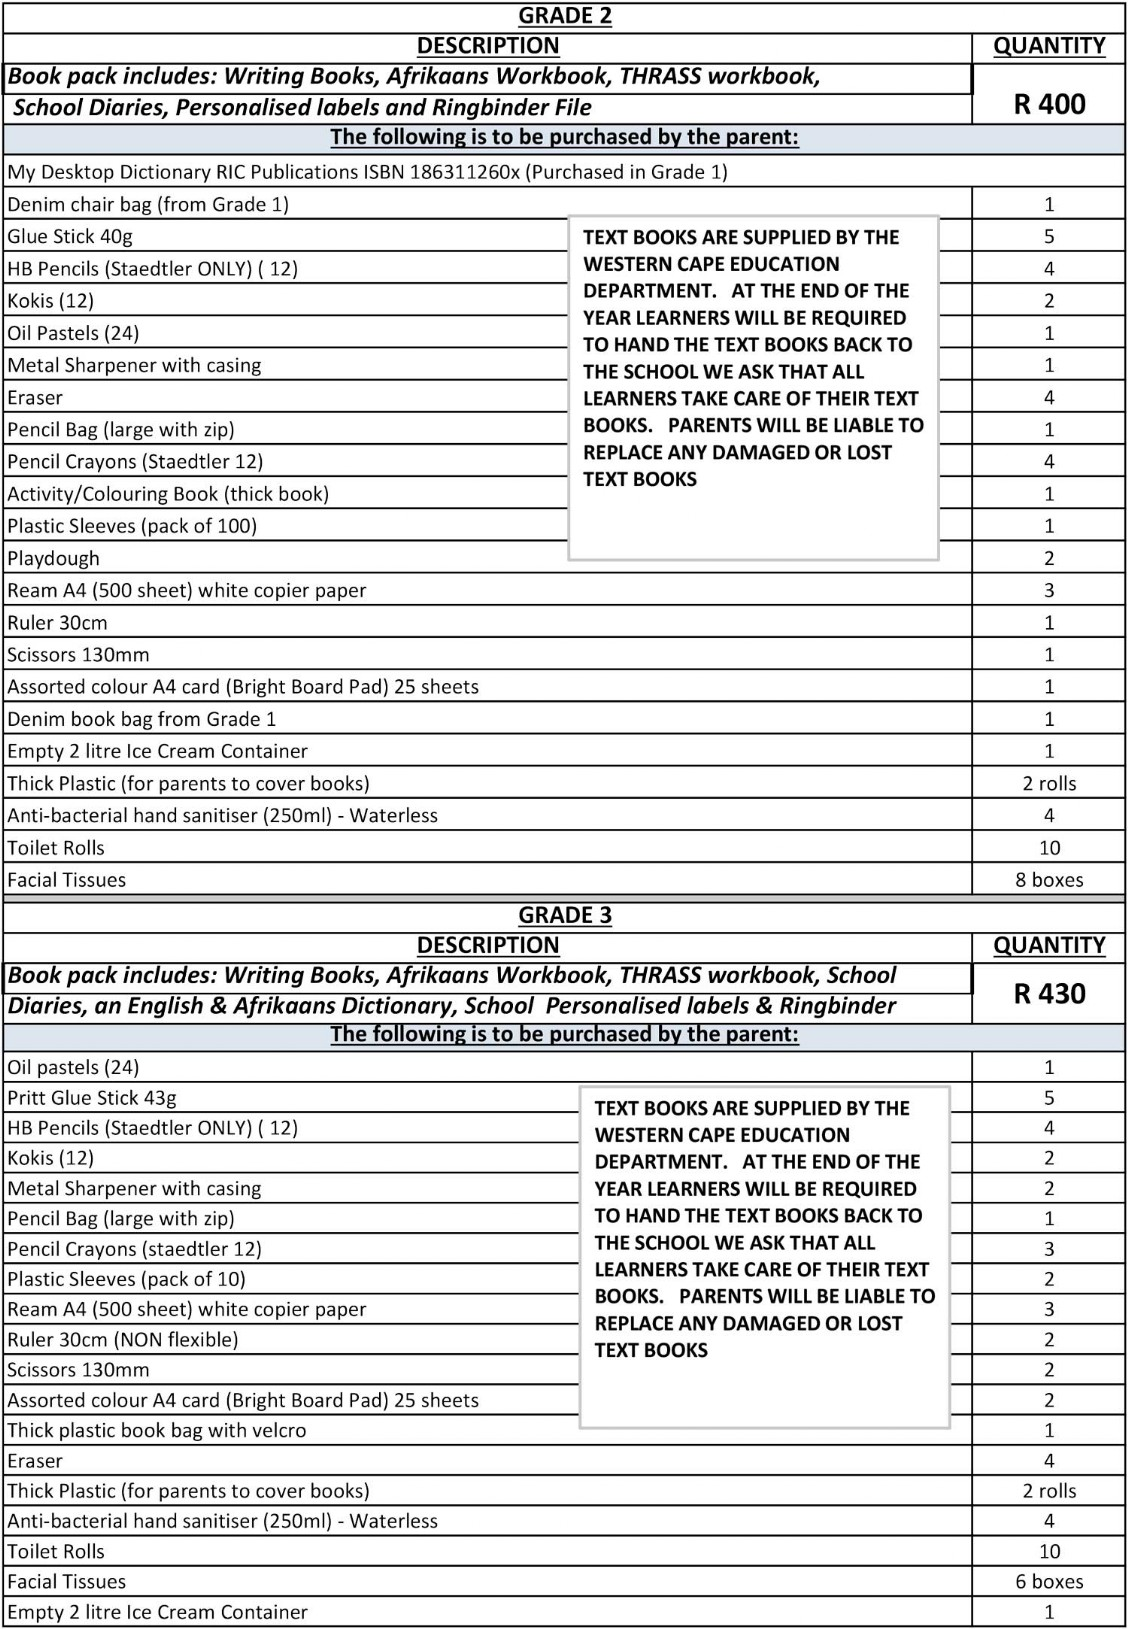 Stationery List 2019 021 797 8010 Sunlands Primary School